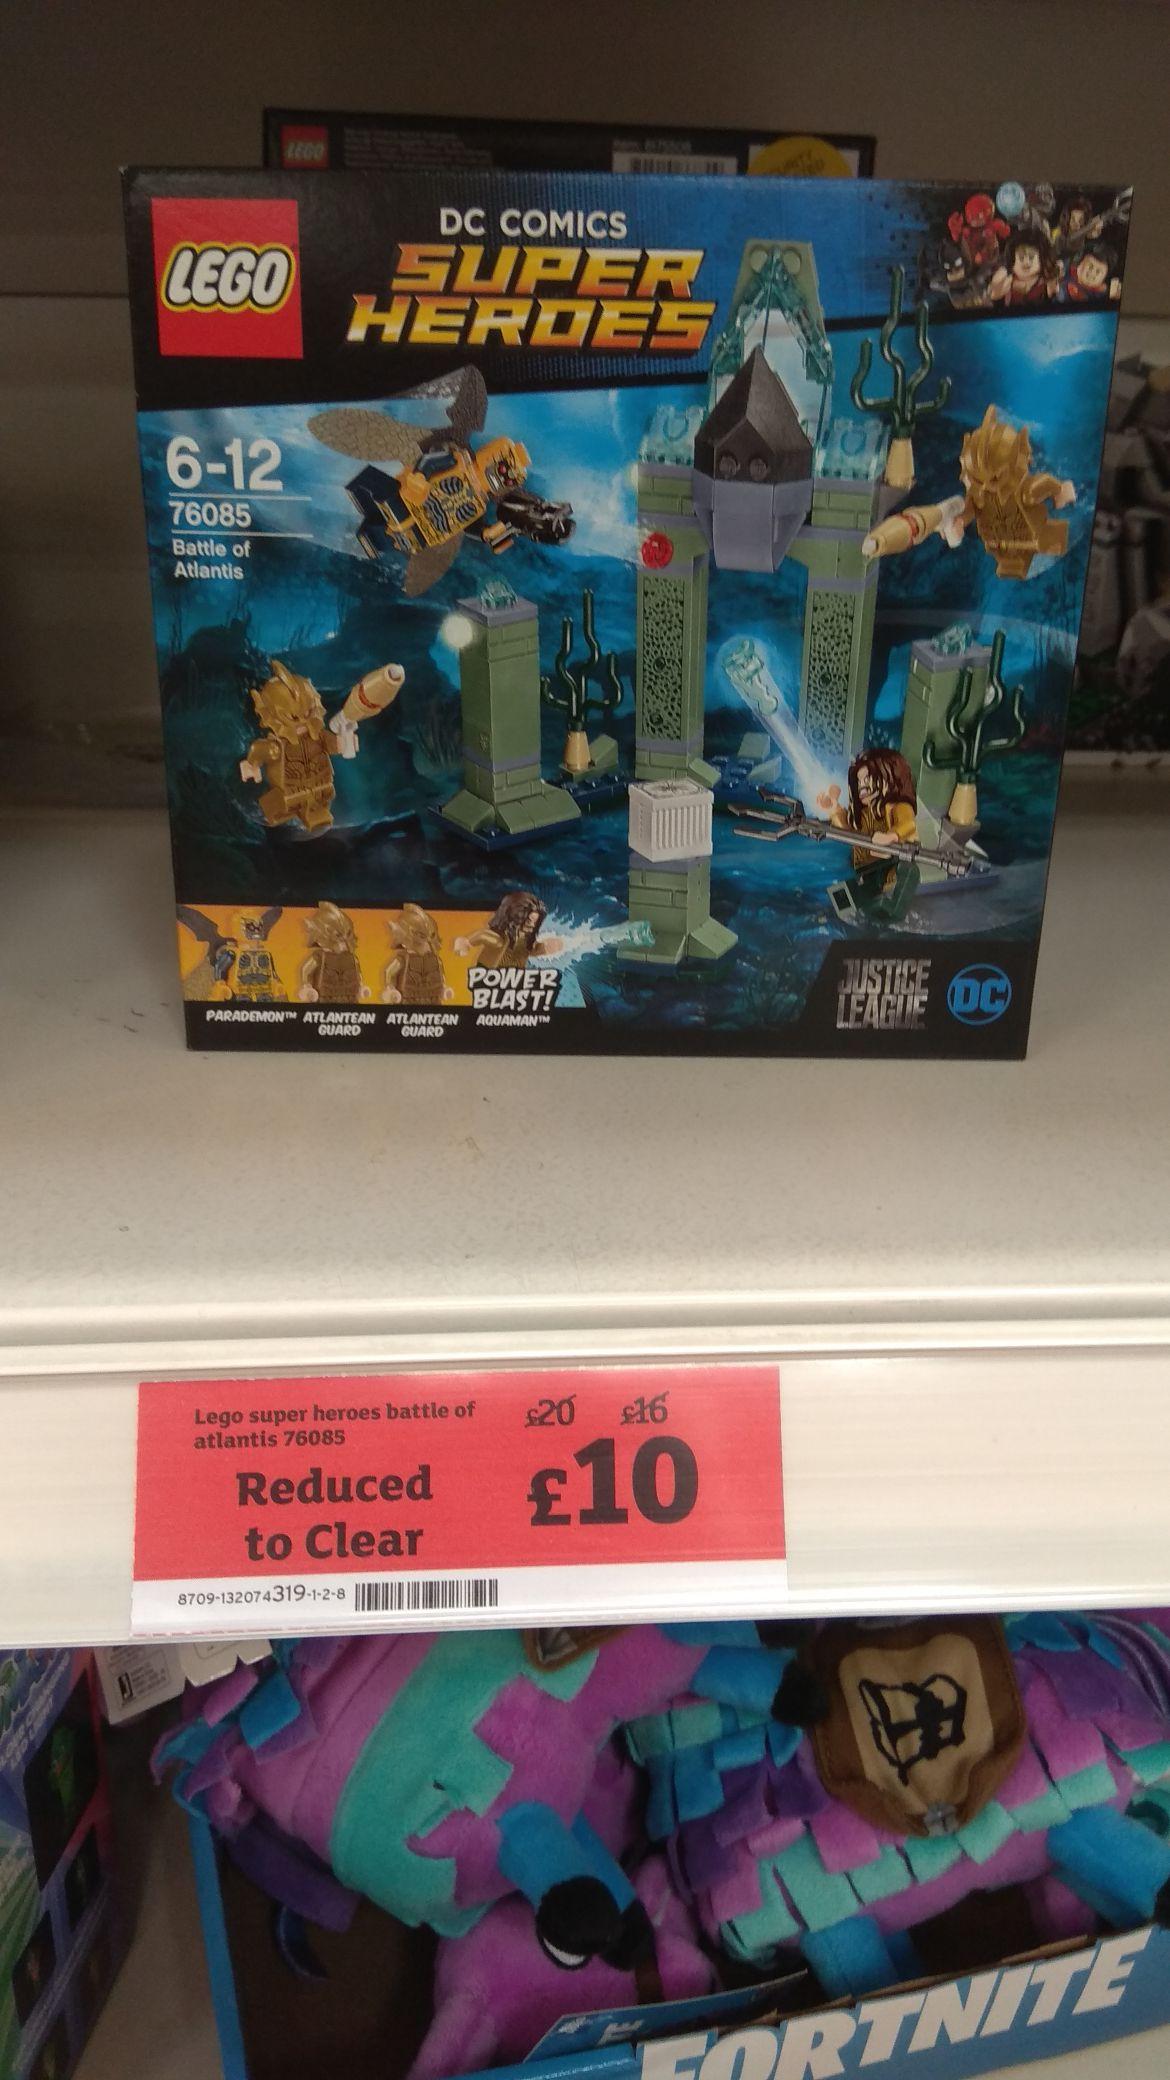 Lego battle of Atlantis £10 at Sainsbury's instore